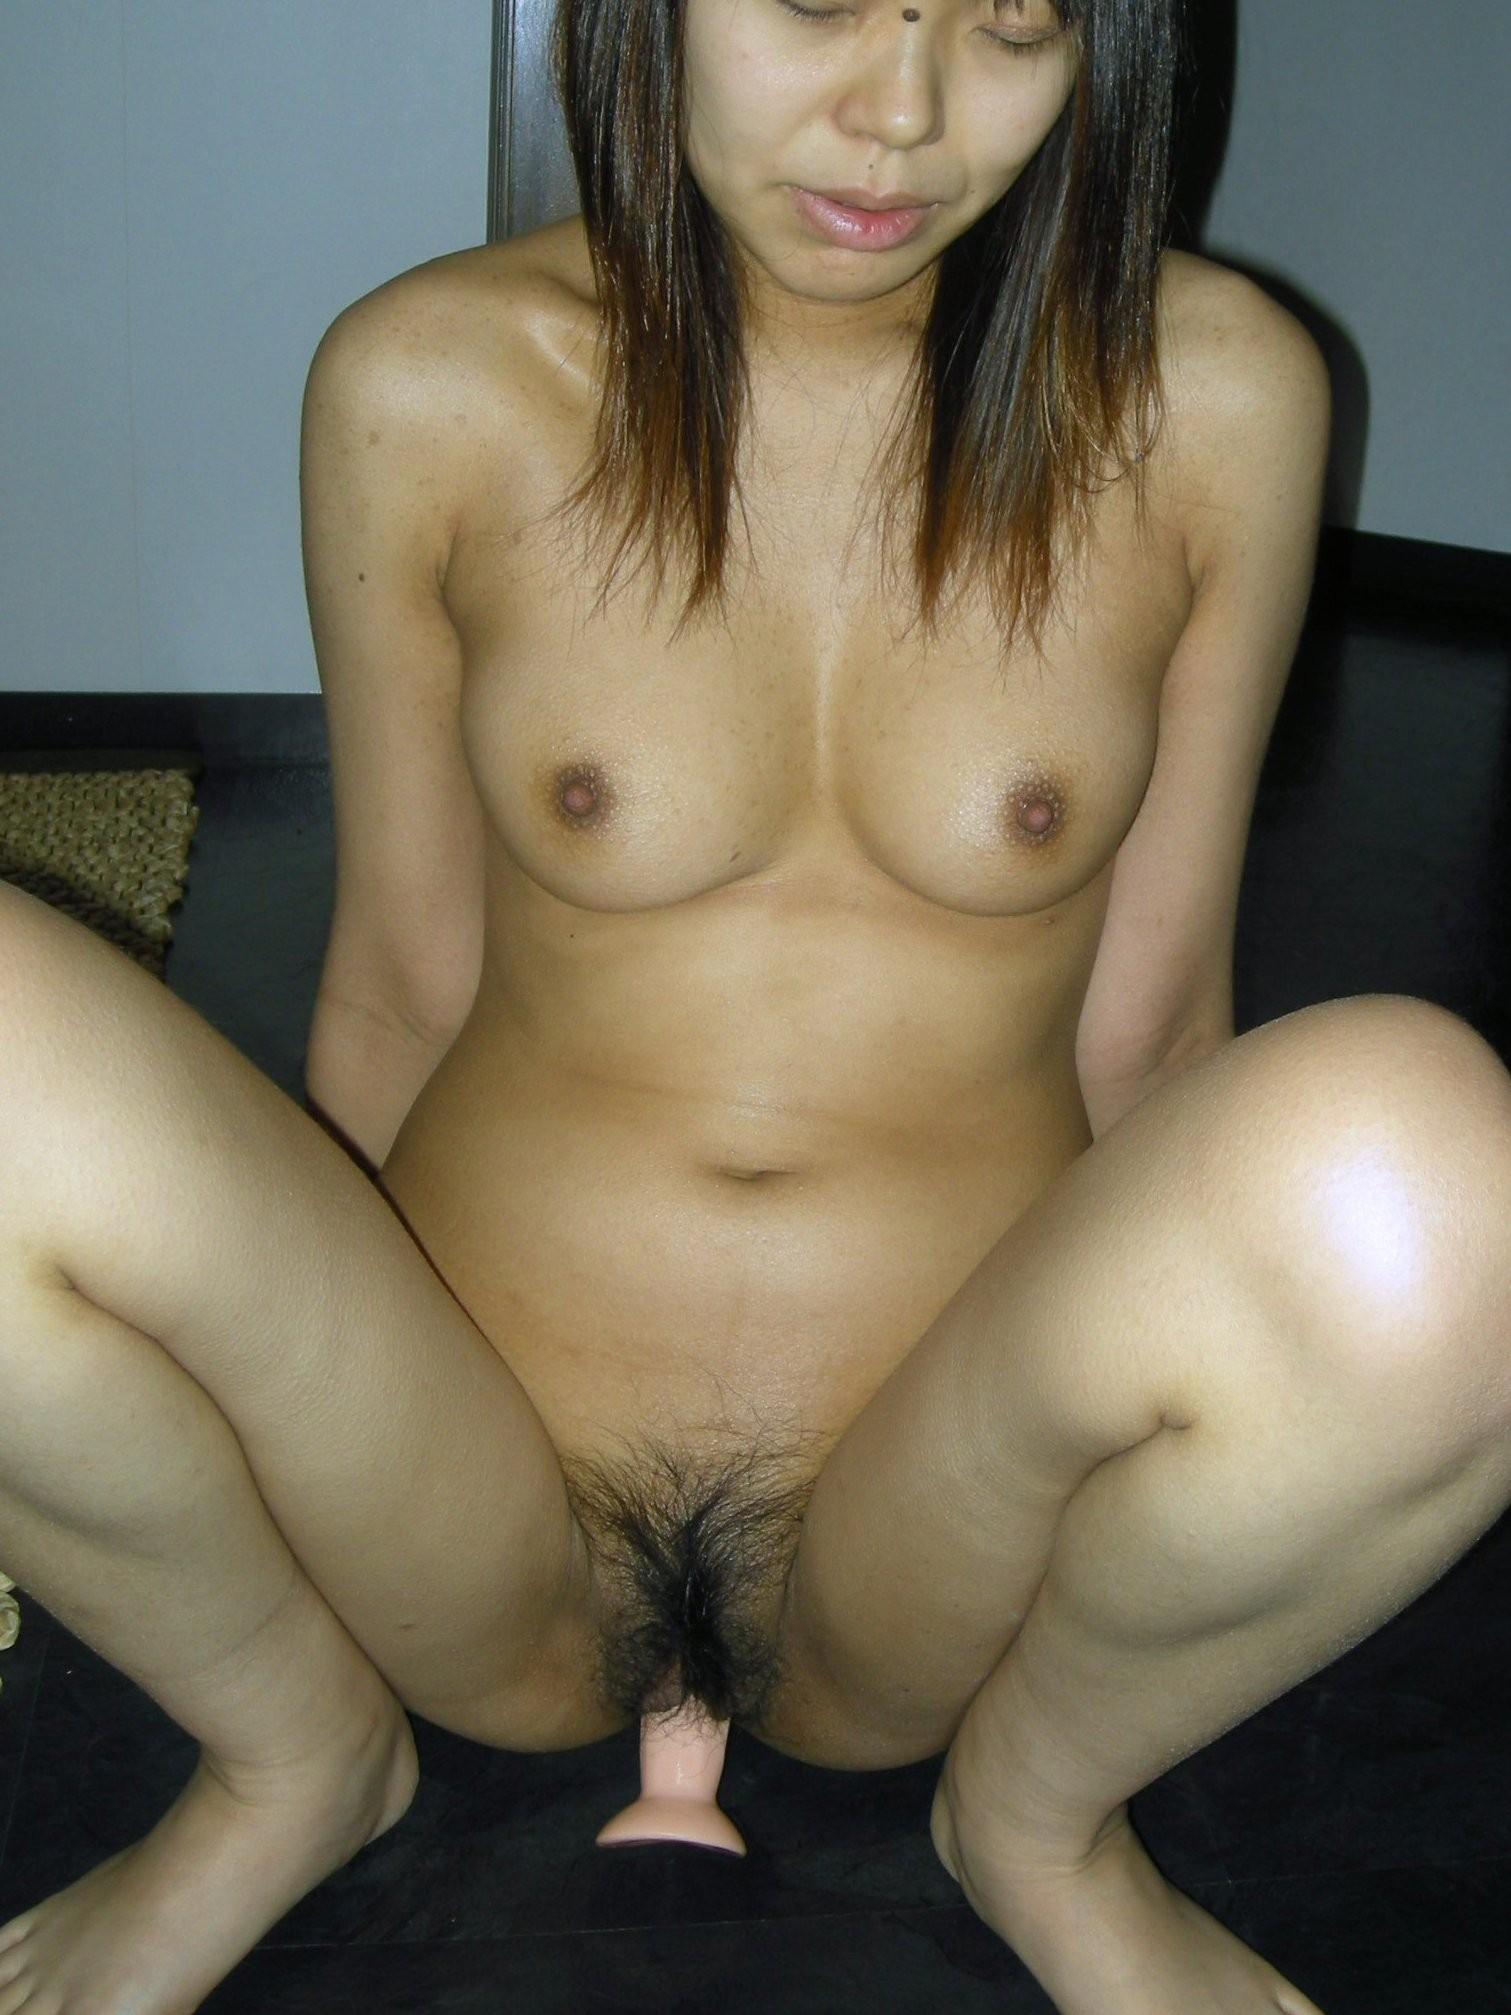 Stacy martin amp shia labeouf clip 2 nymphomaniac - 3 part 5